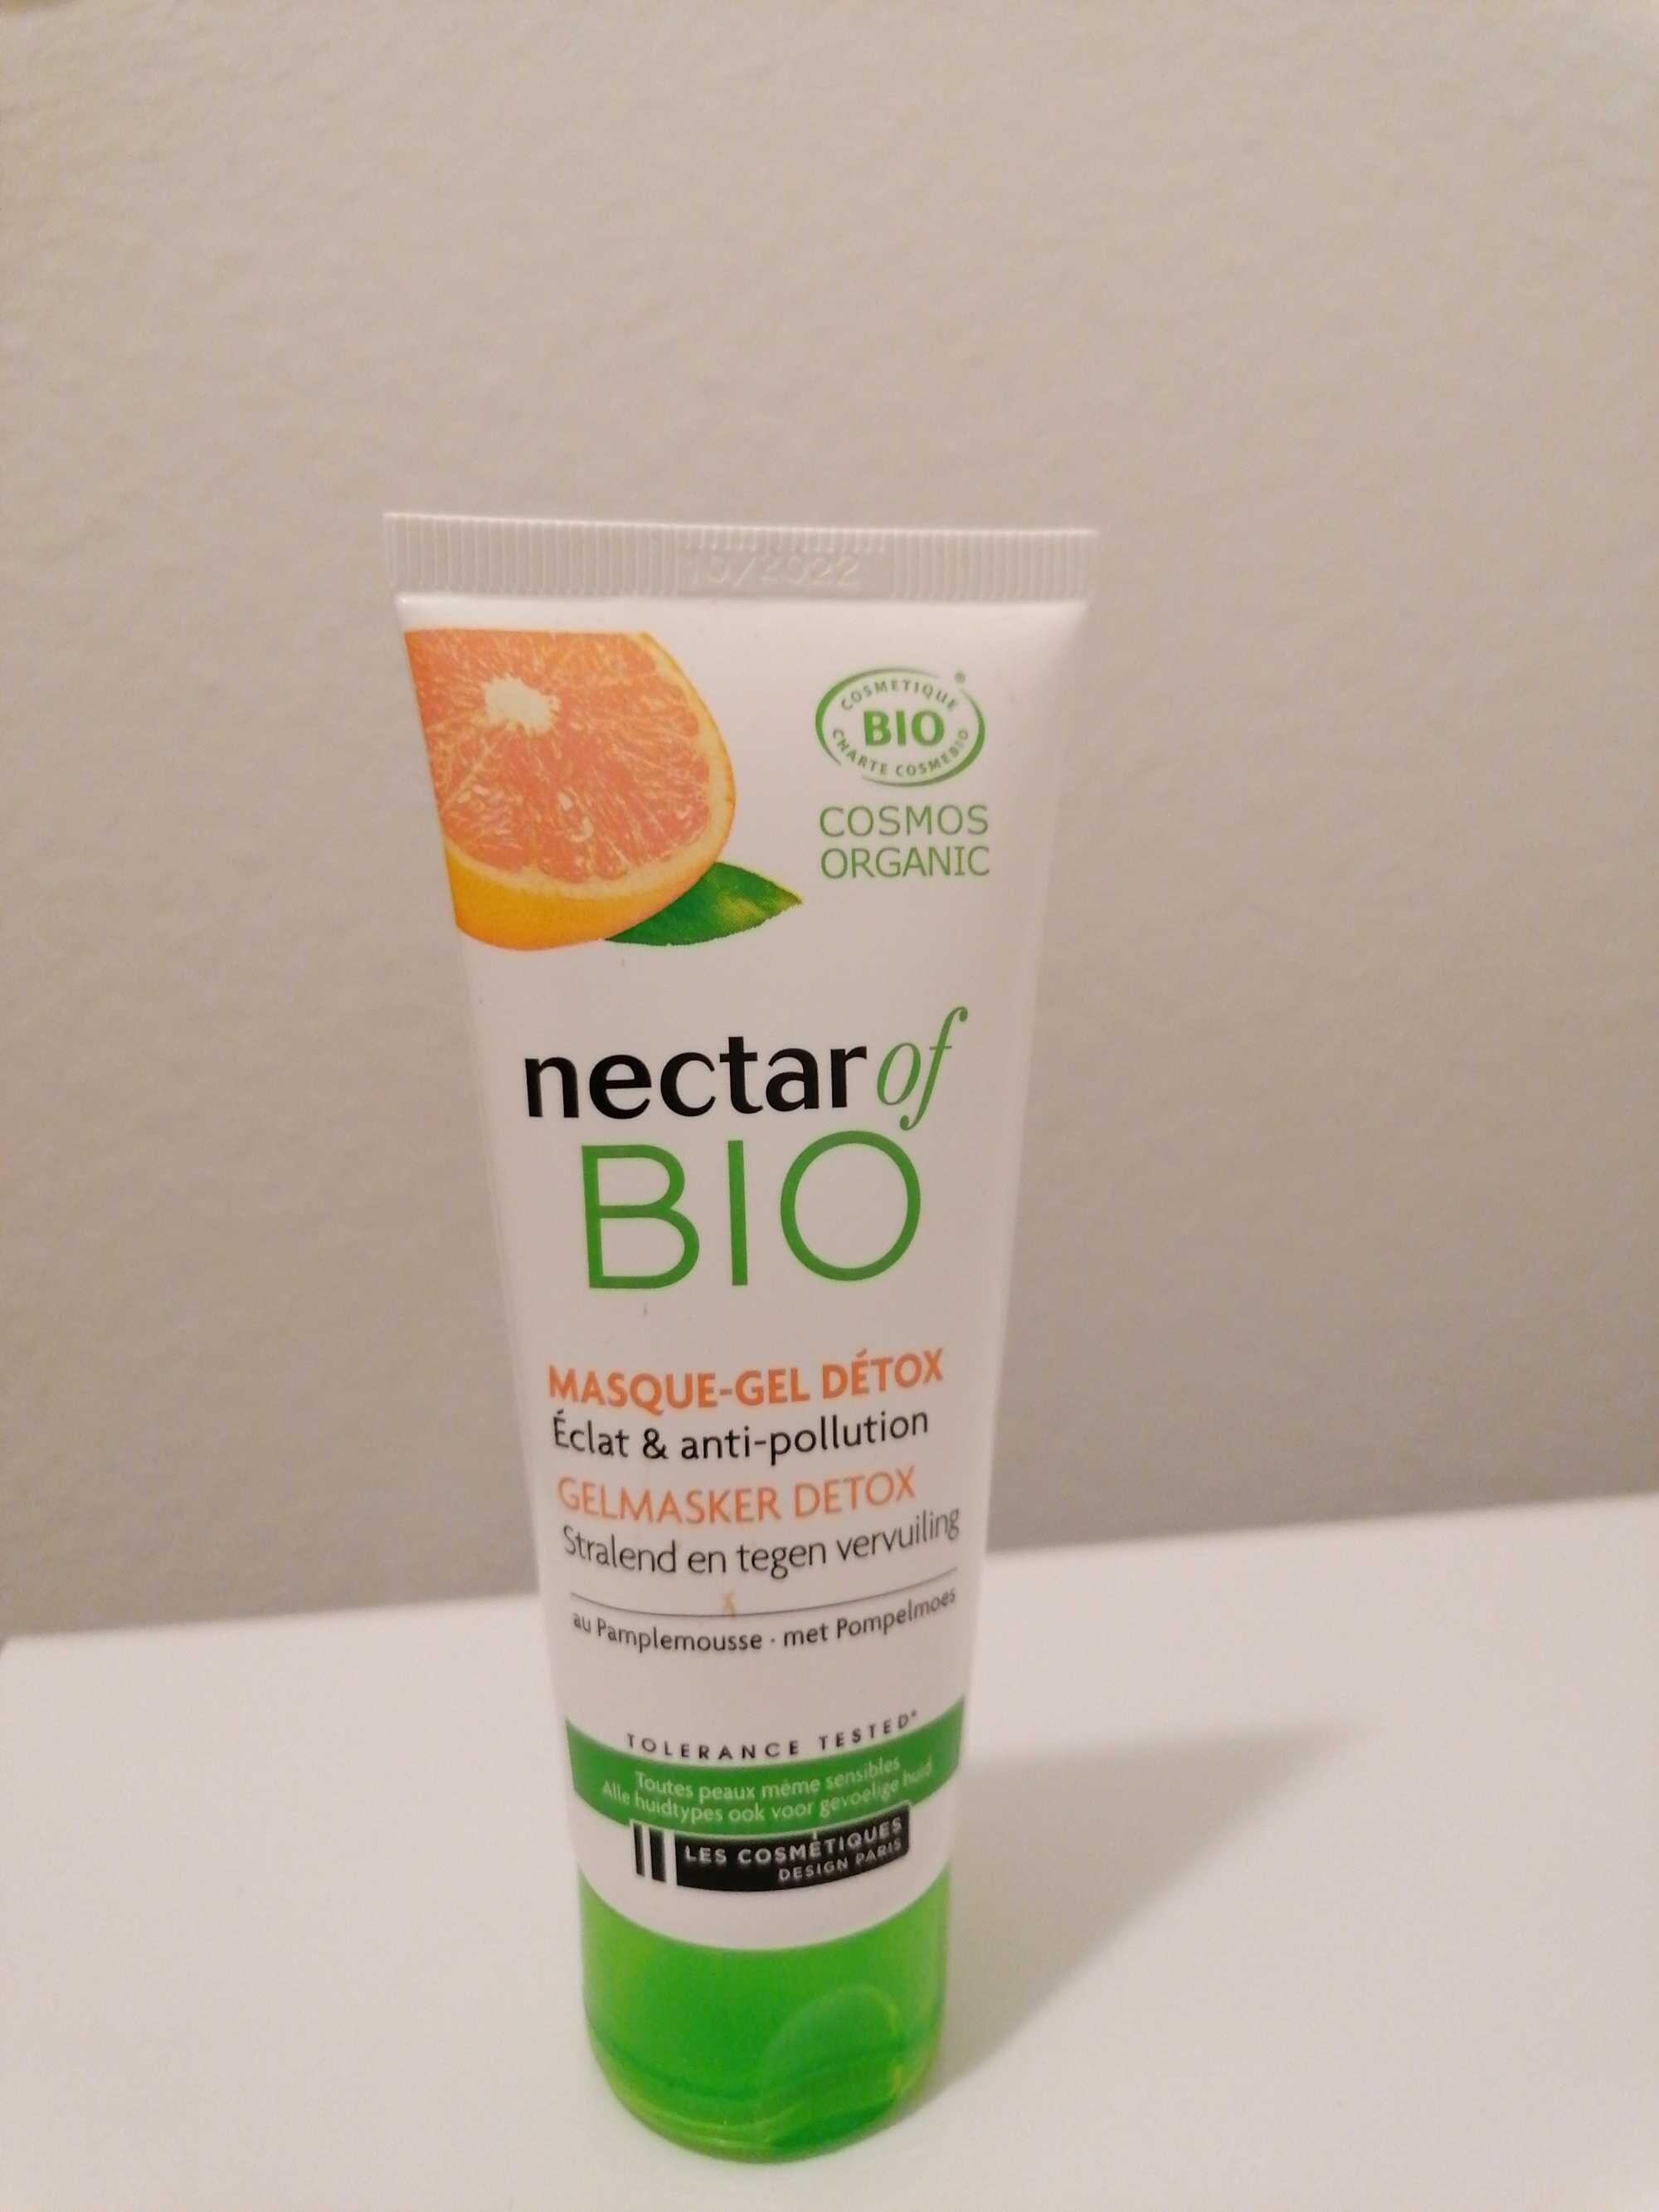 Masque gel detox éclat & anti pollution - Product - fr